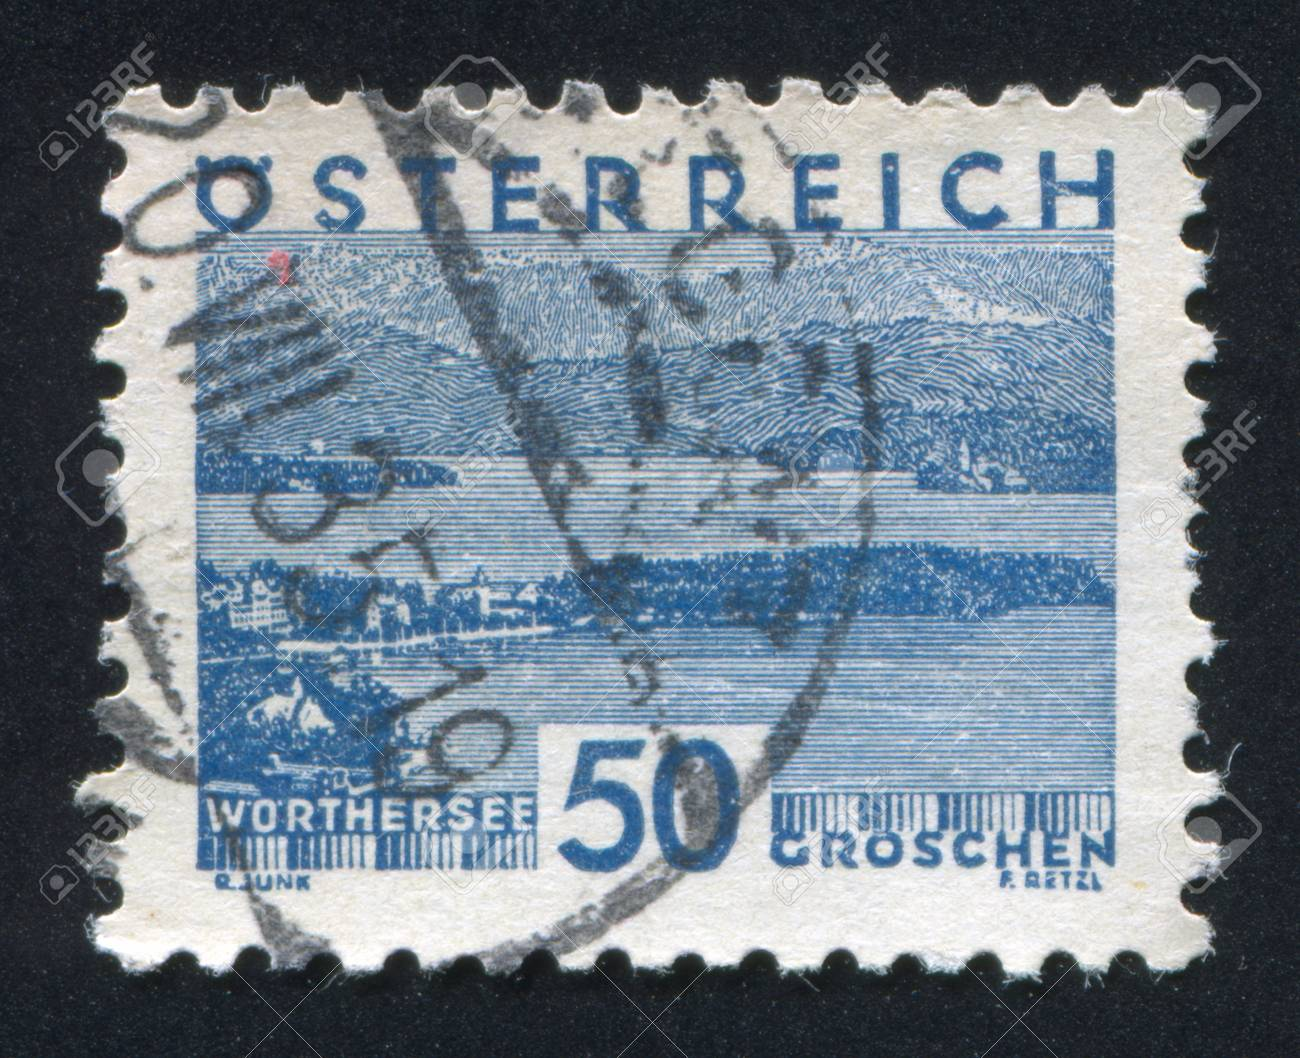 AUSTRIA - CIRCA 1930: stamp printed by Austria, shows Worthersee, circa 1930 Stock Photo - 18113217